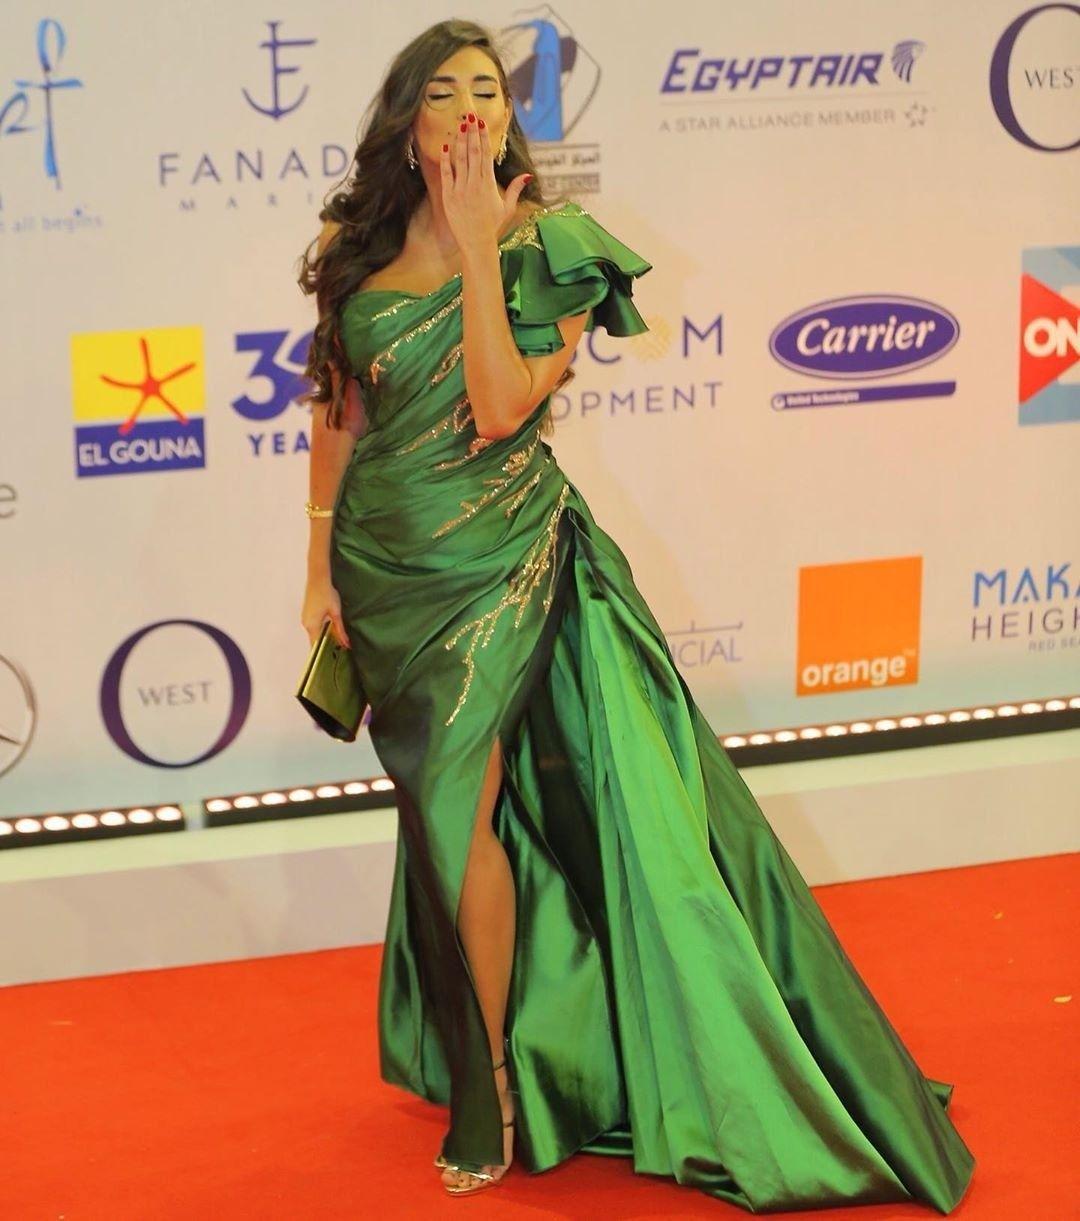 Yasmin Sabry In Green Dress From El Gouna Film Festival Opening Cermony Red Carpet 2019 Formal Dresses Long Instagram Fashion Green Dress